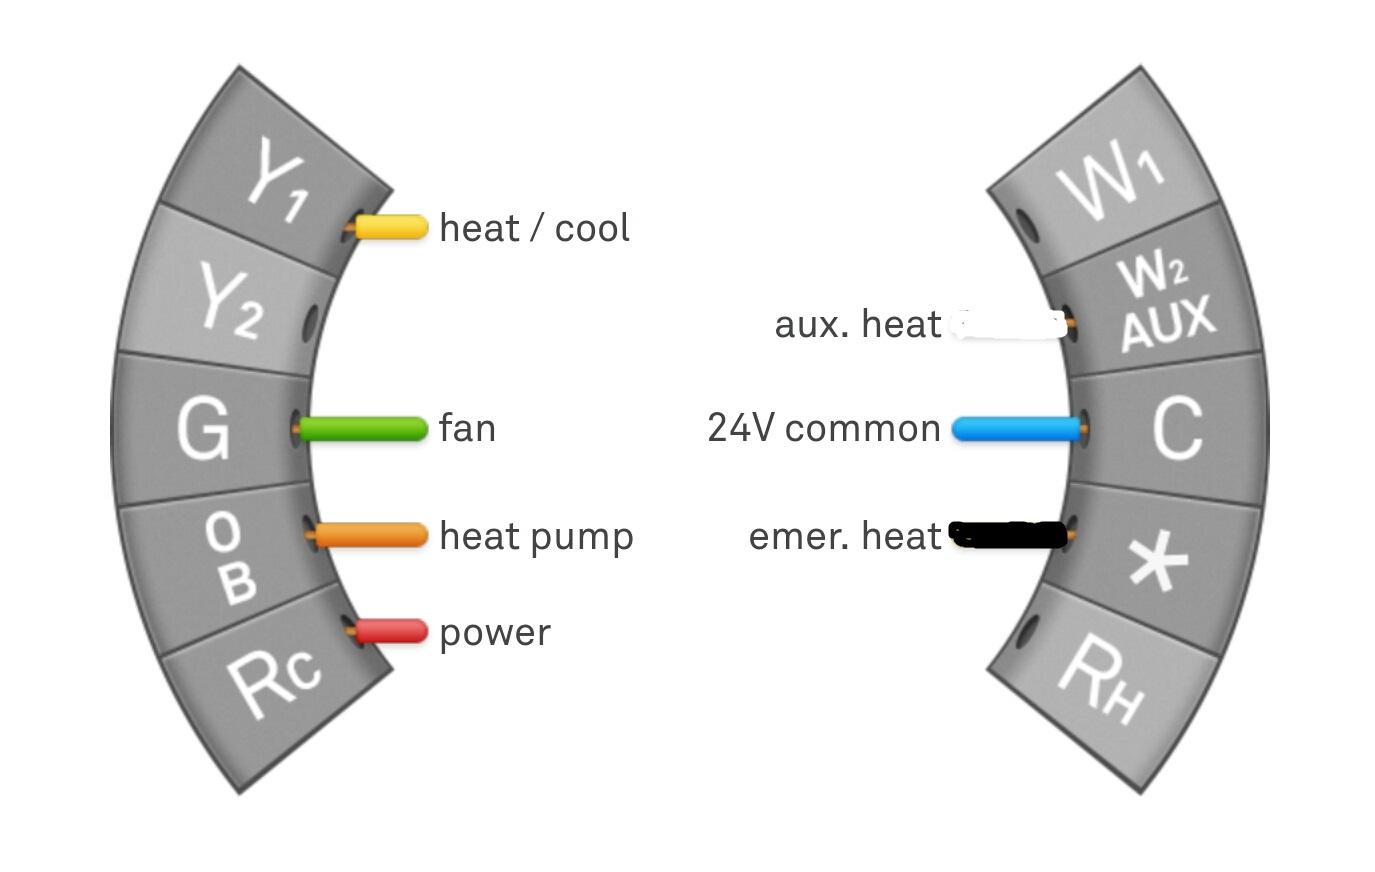 medium resolution of nest radiant heat wiring diagram wiring diagram blog nest thermostat heat pump wiring diagram heat pump